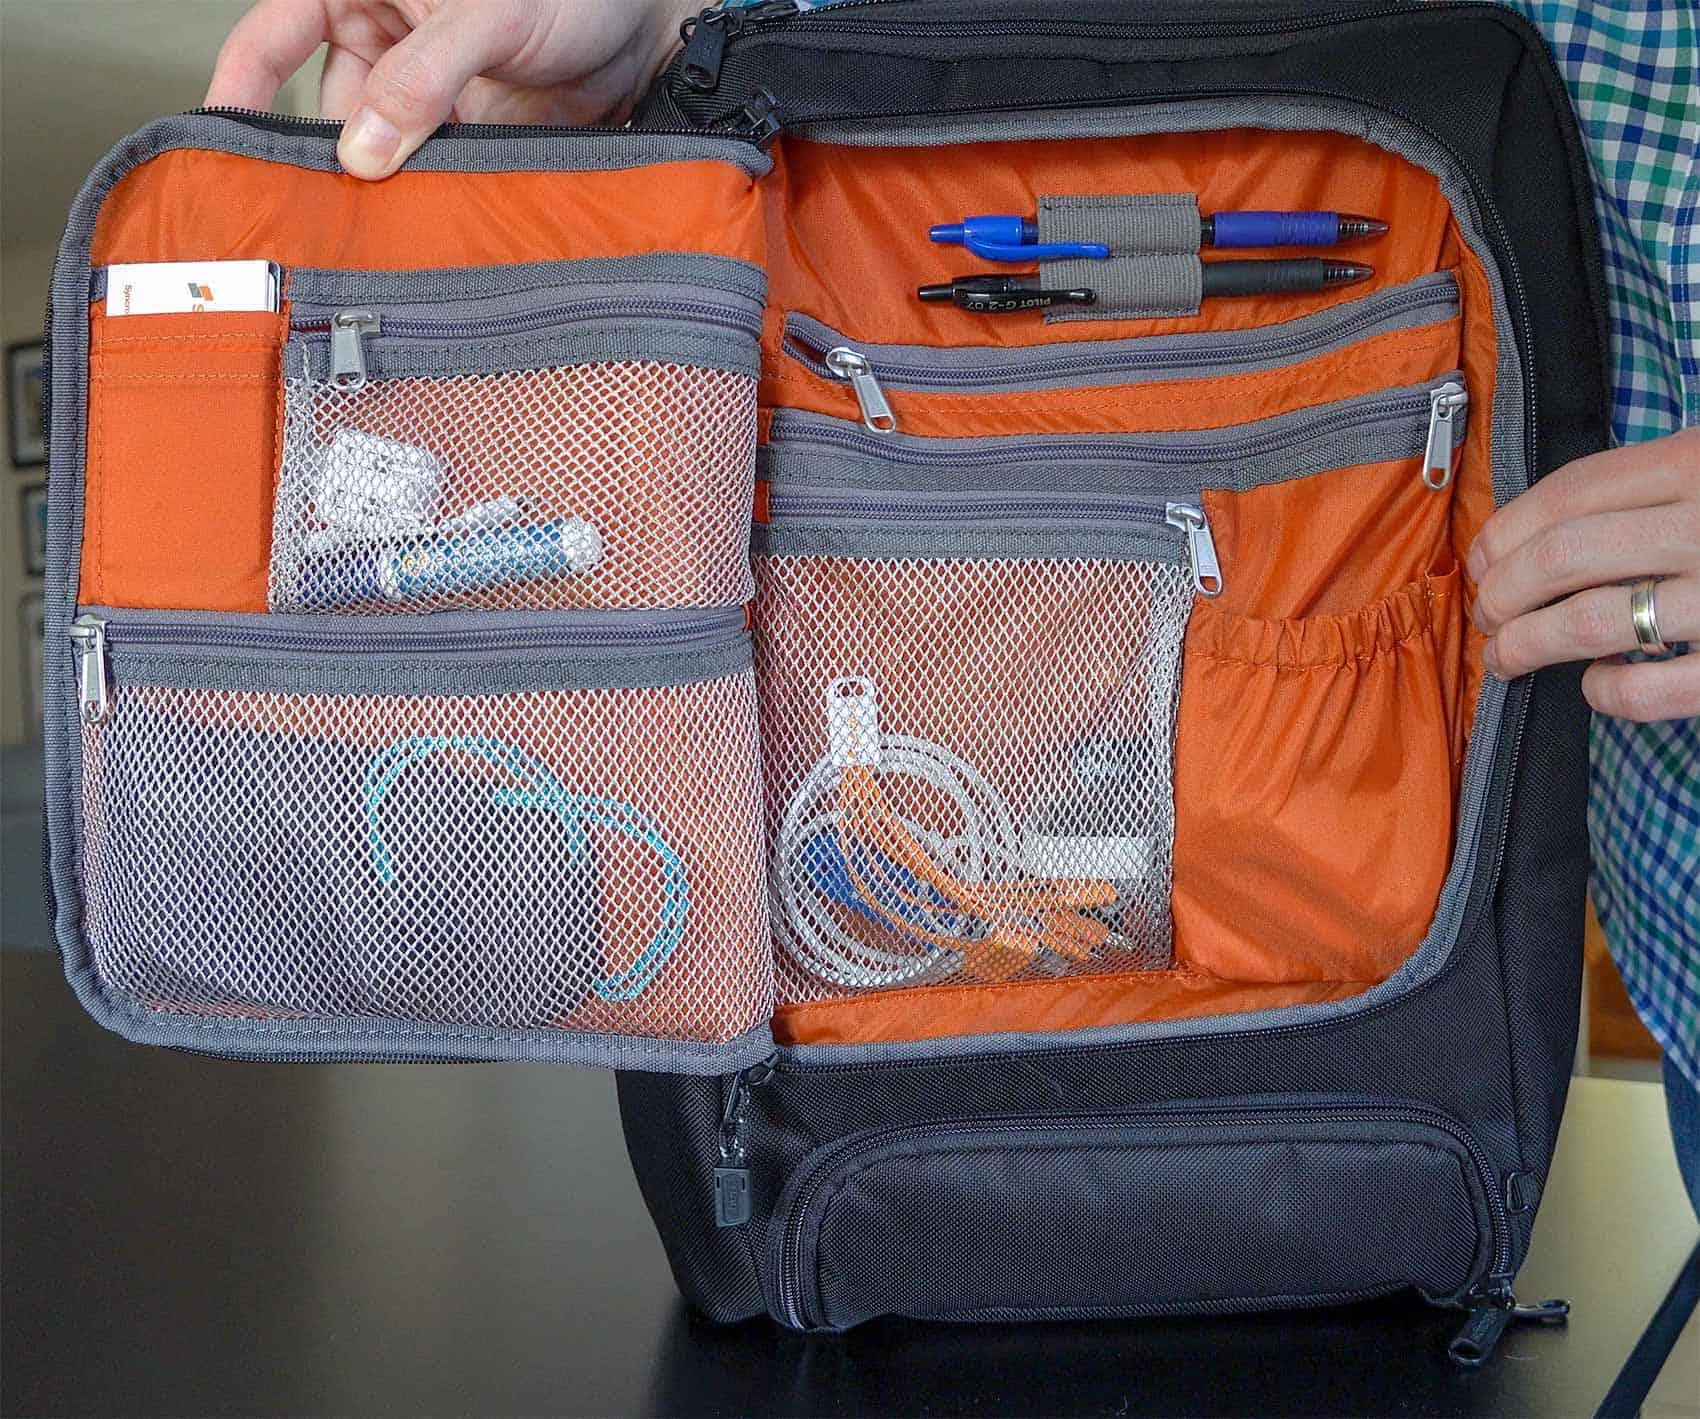 ebags professional slim laptop backpack reviews